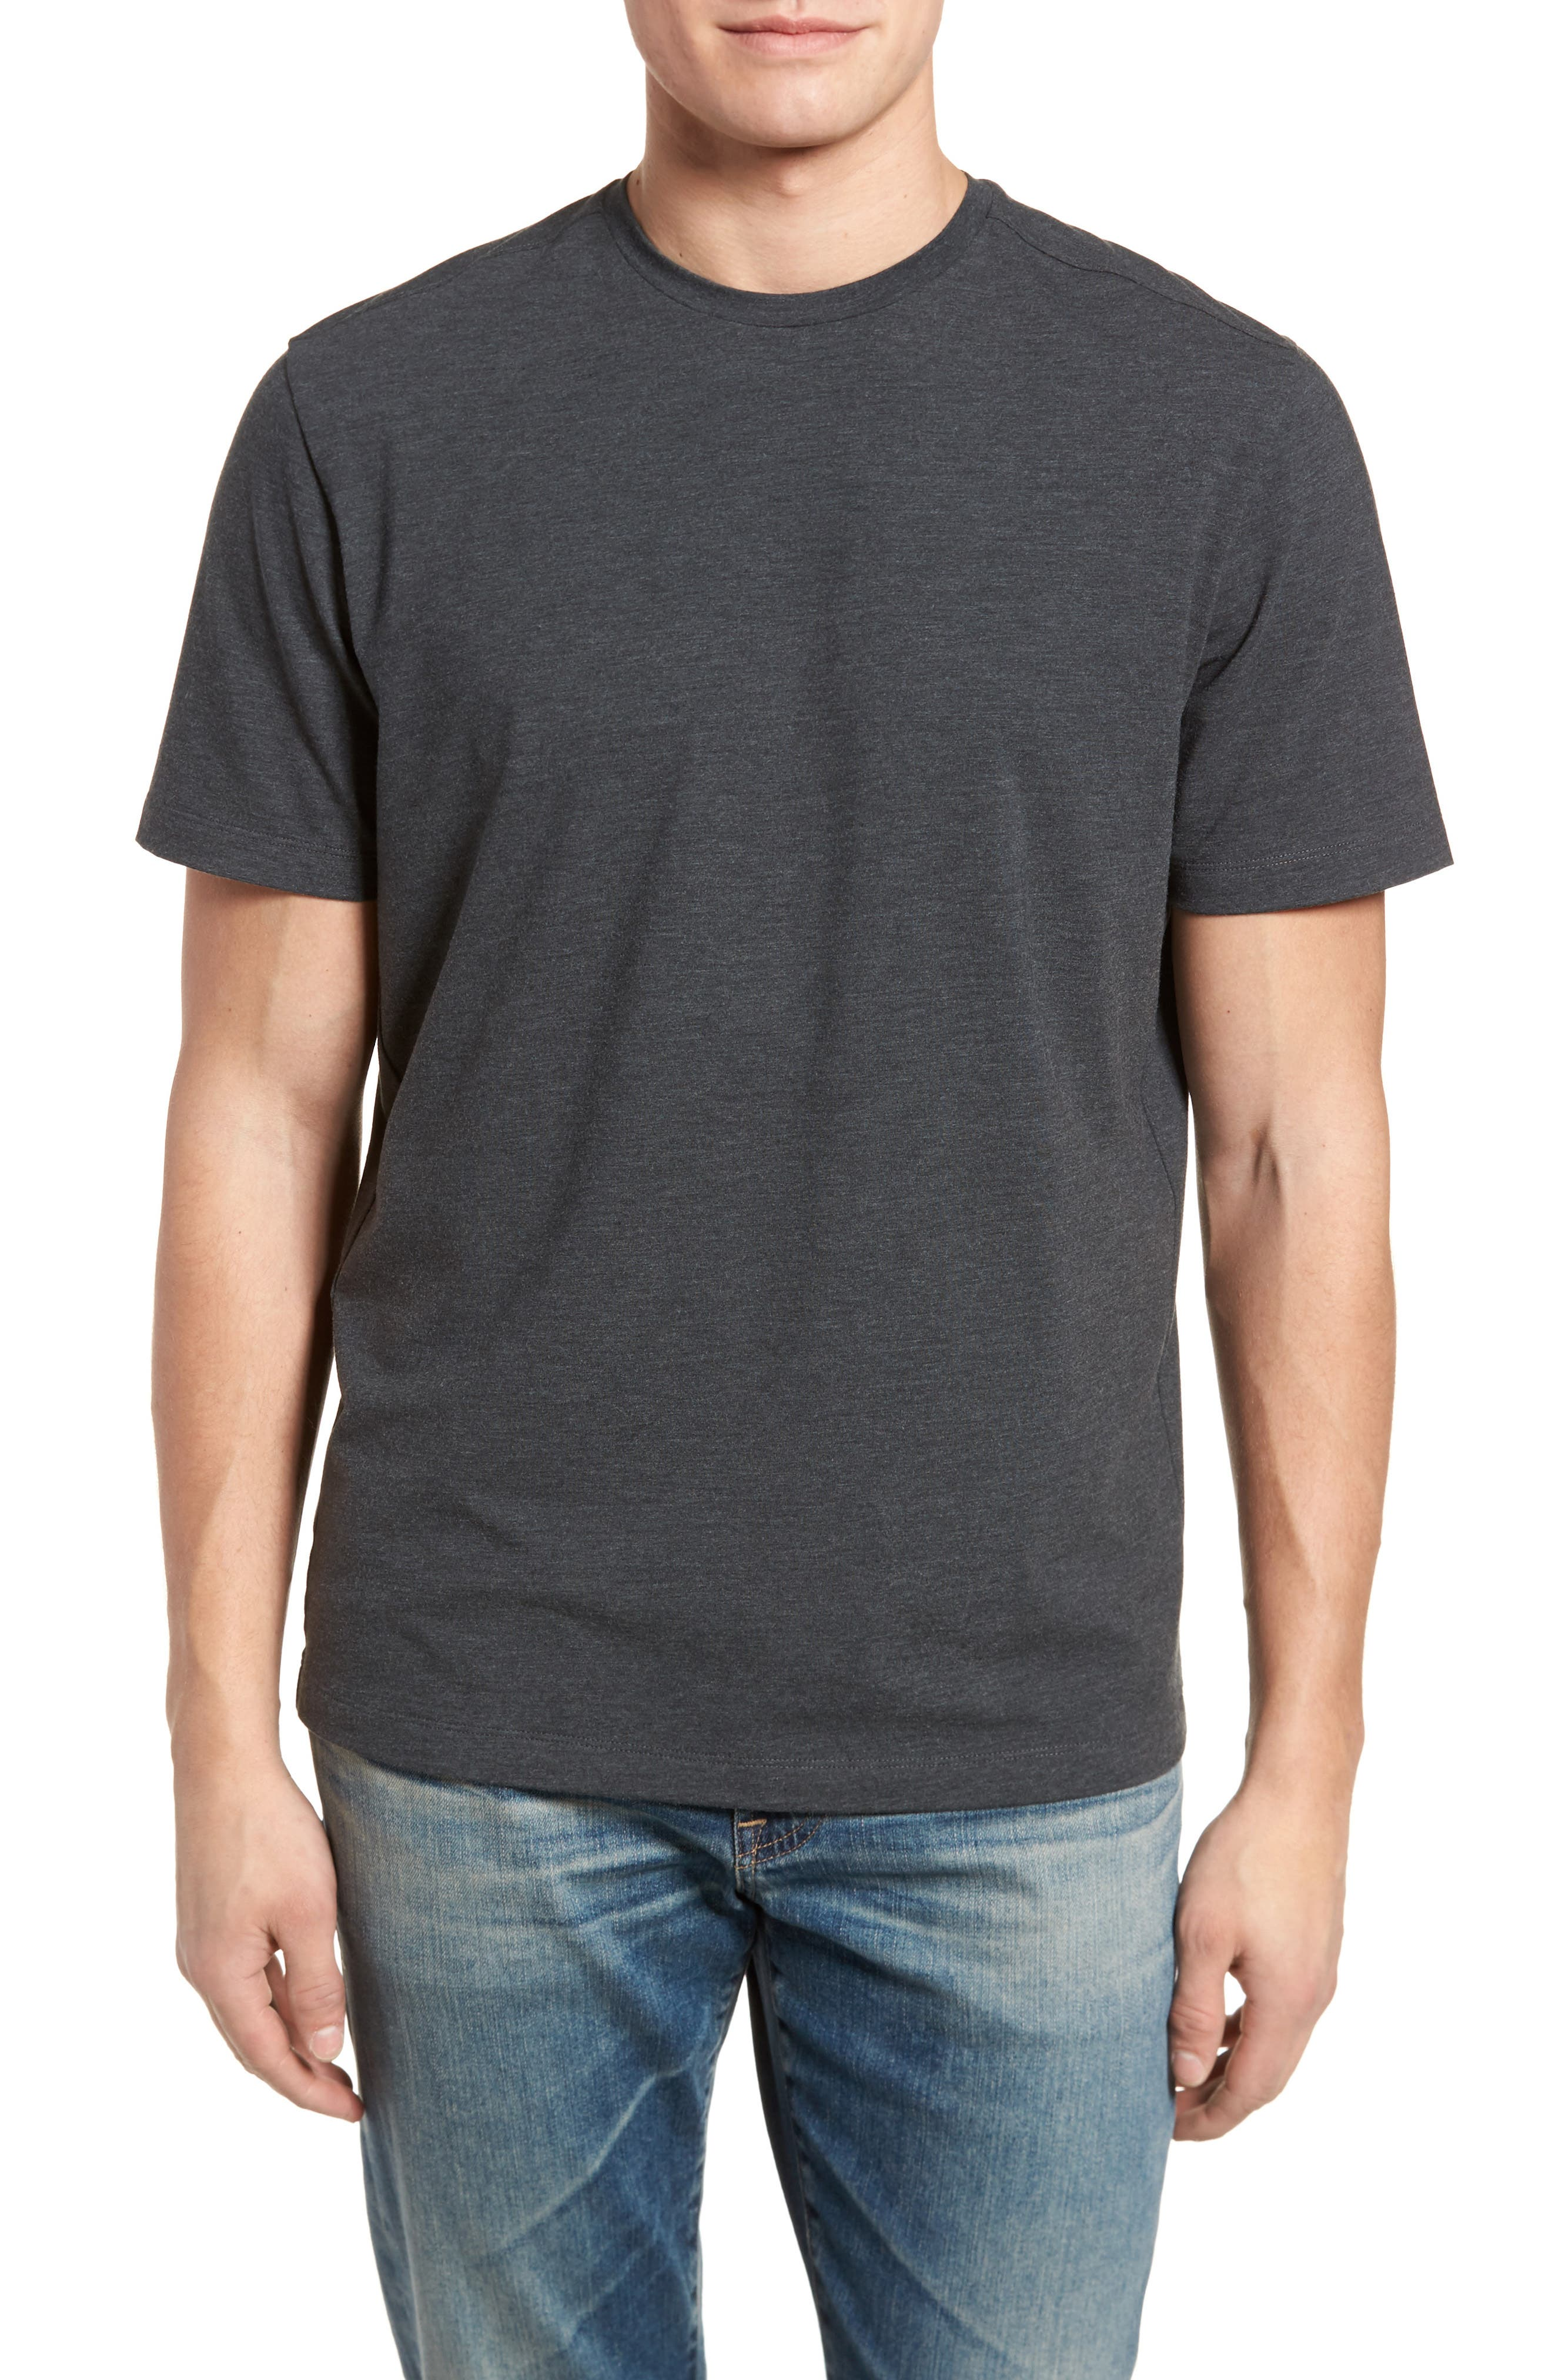 Alternate Image 1 Selected - Tommy Bahama Tropicool T-Shirt